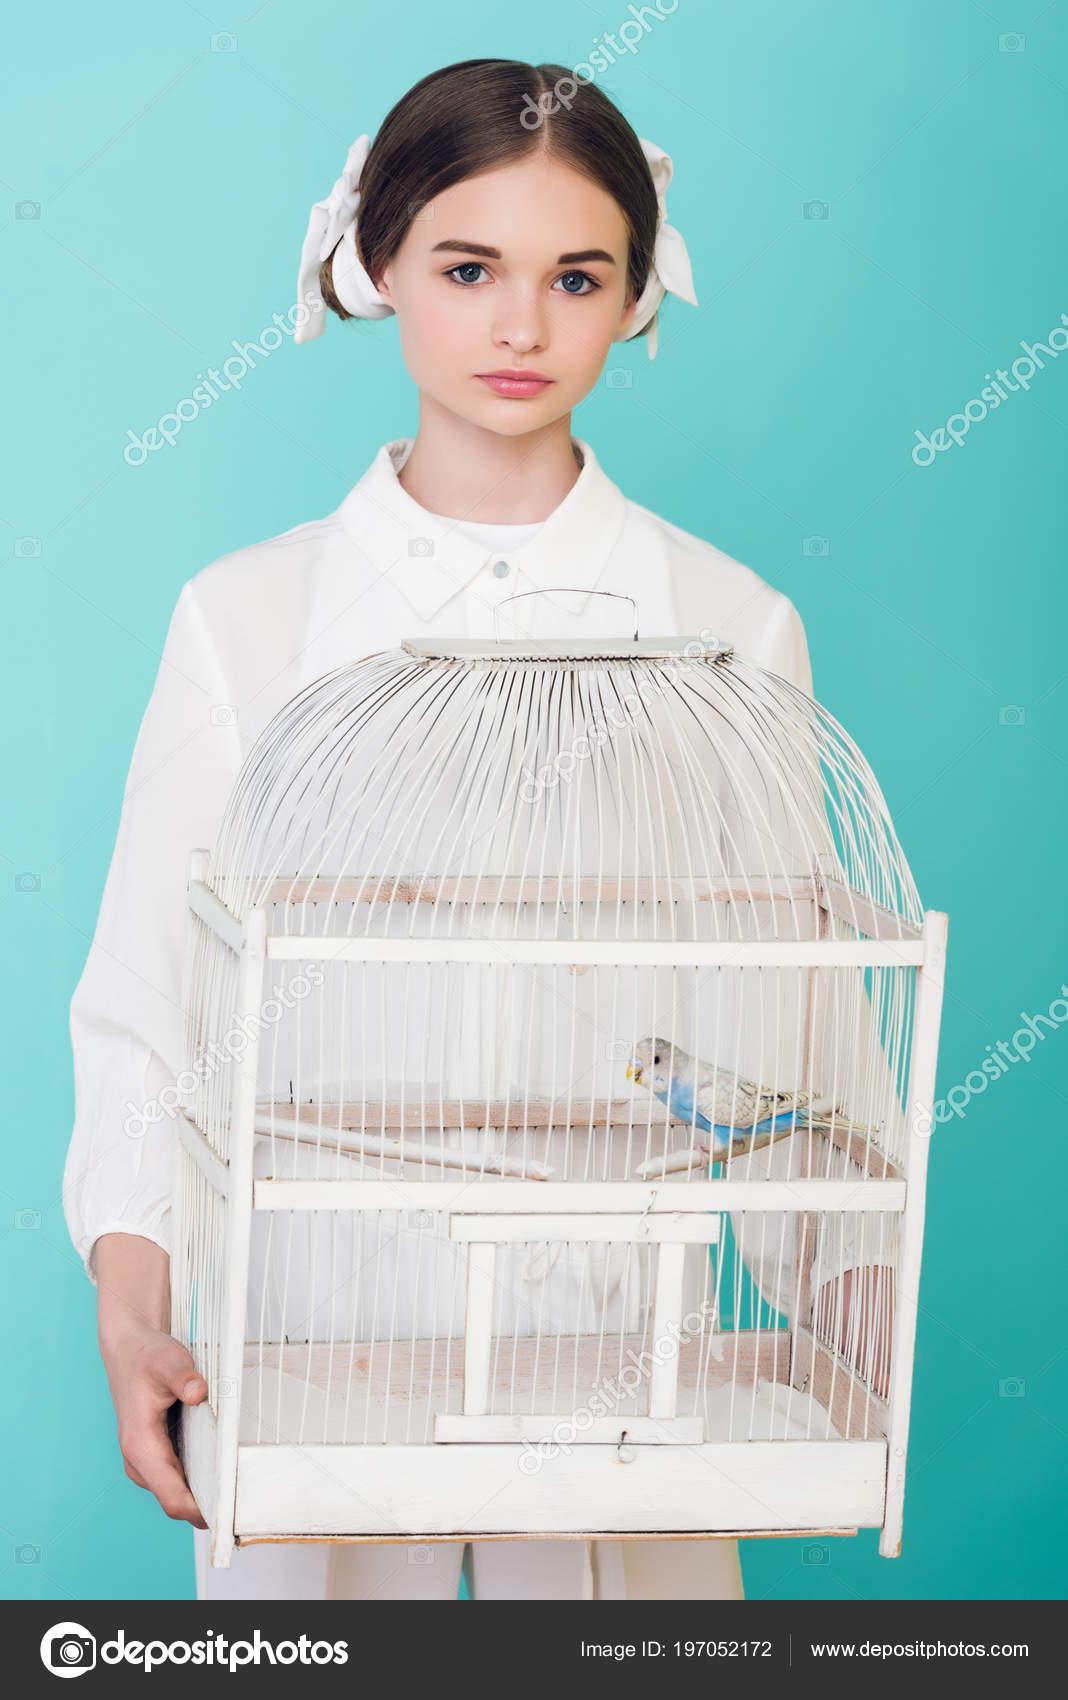 Teen κορίτσι μεγάλο μαύρο πουλί